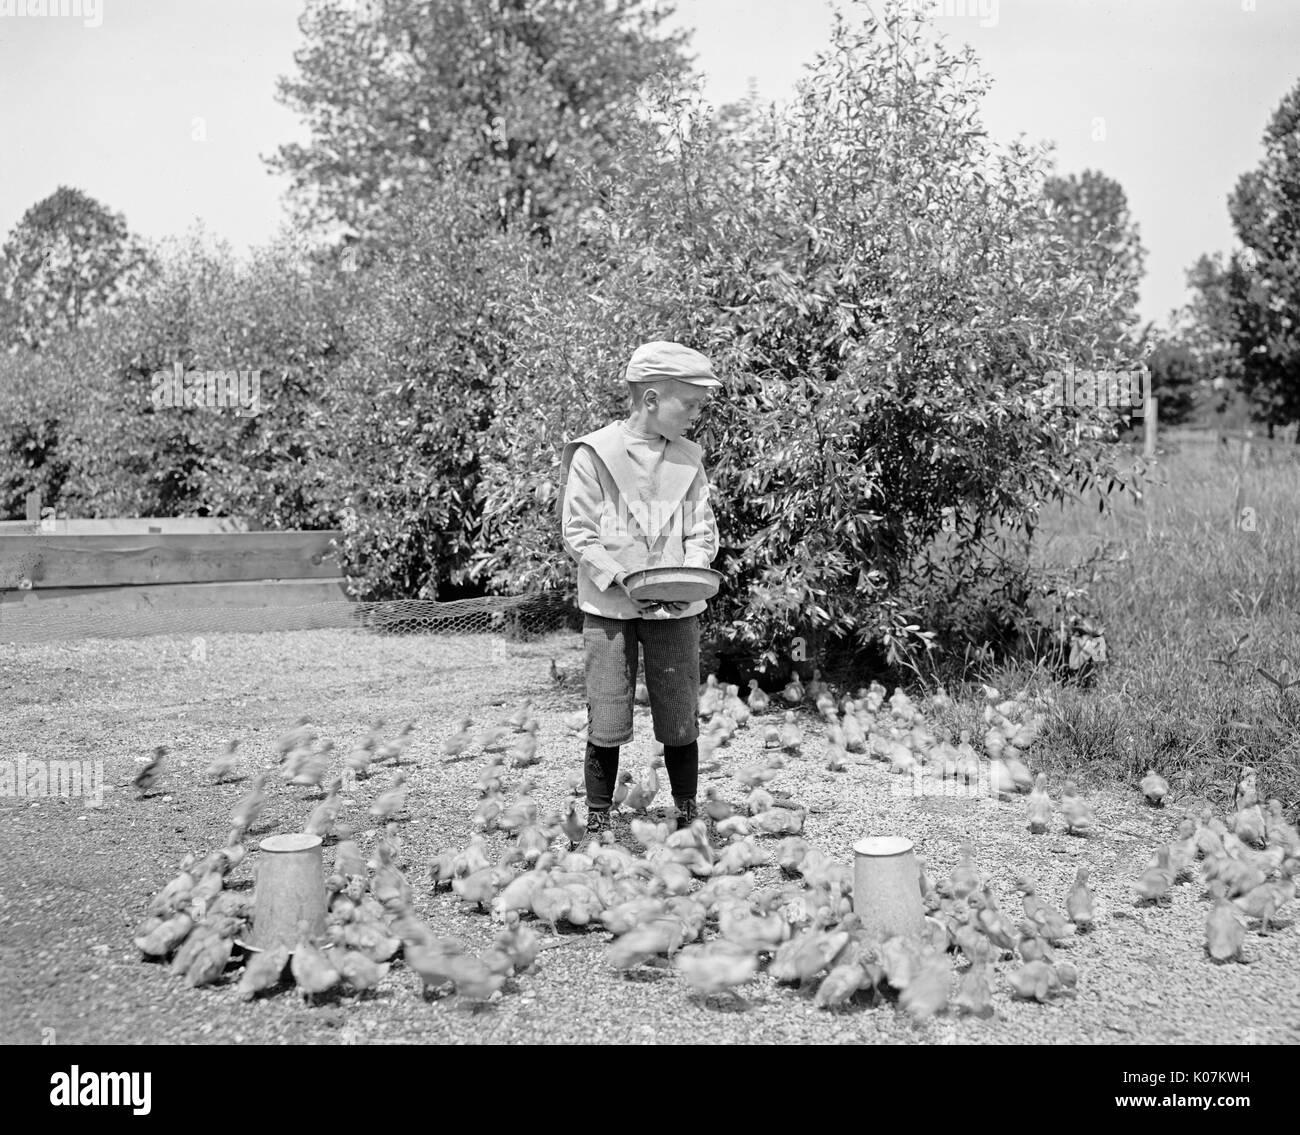 Grosse Isle duck farm, feeding the ducklings     Date: circa 1900 - Stock Image